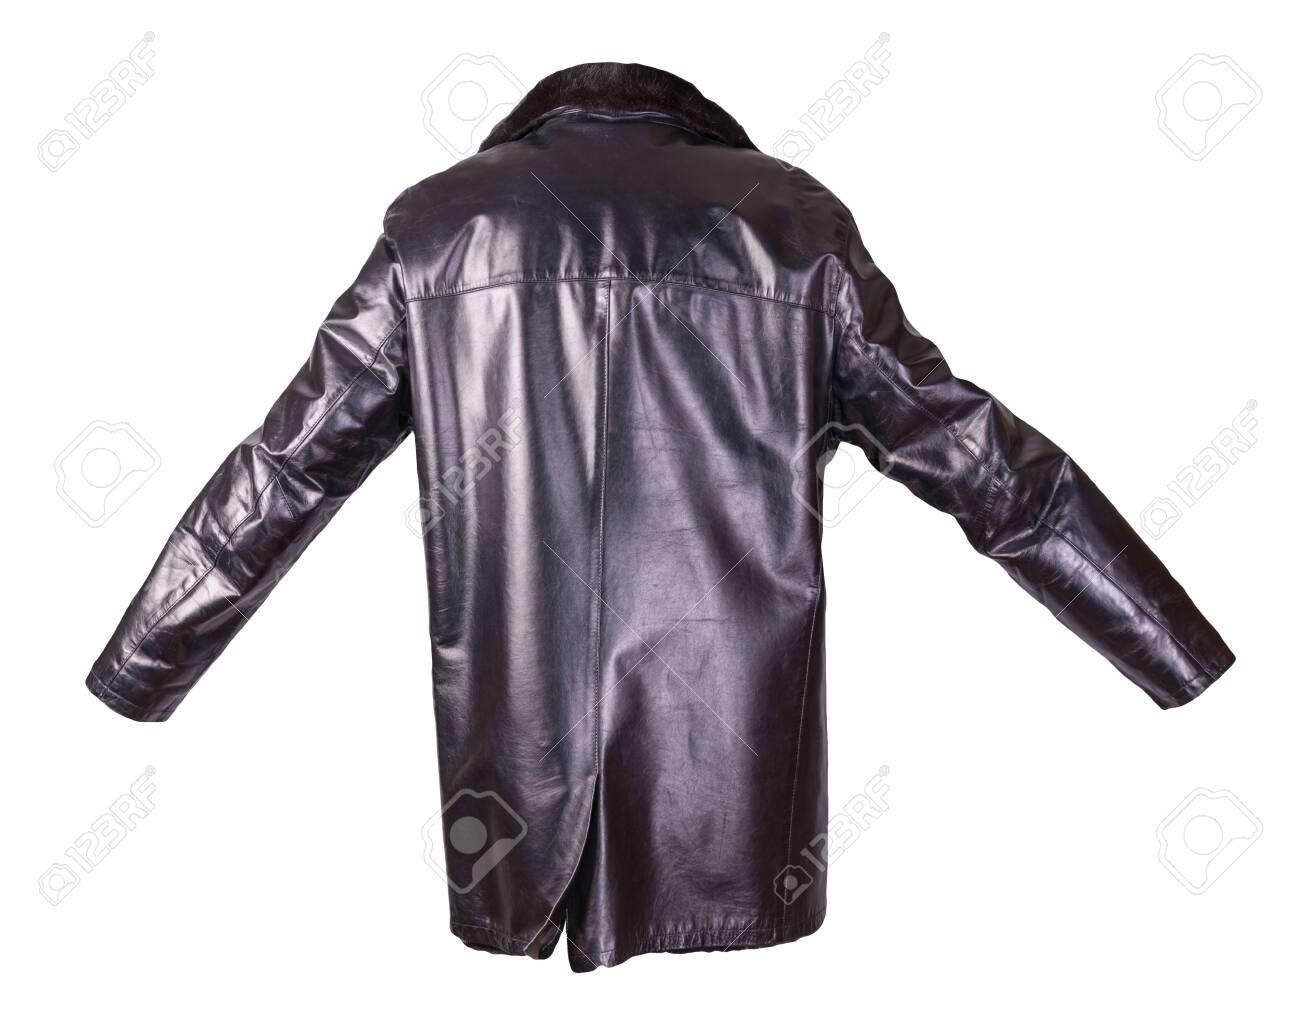 leather male sheepskin coat isolated on white background.black leather men's jacket with fur - 146486124